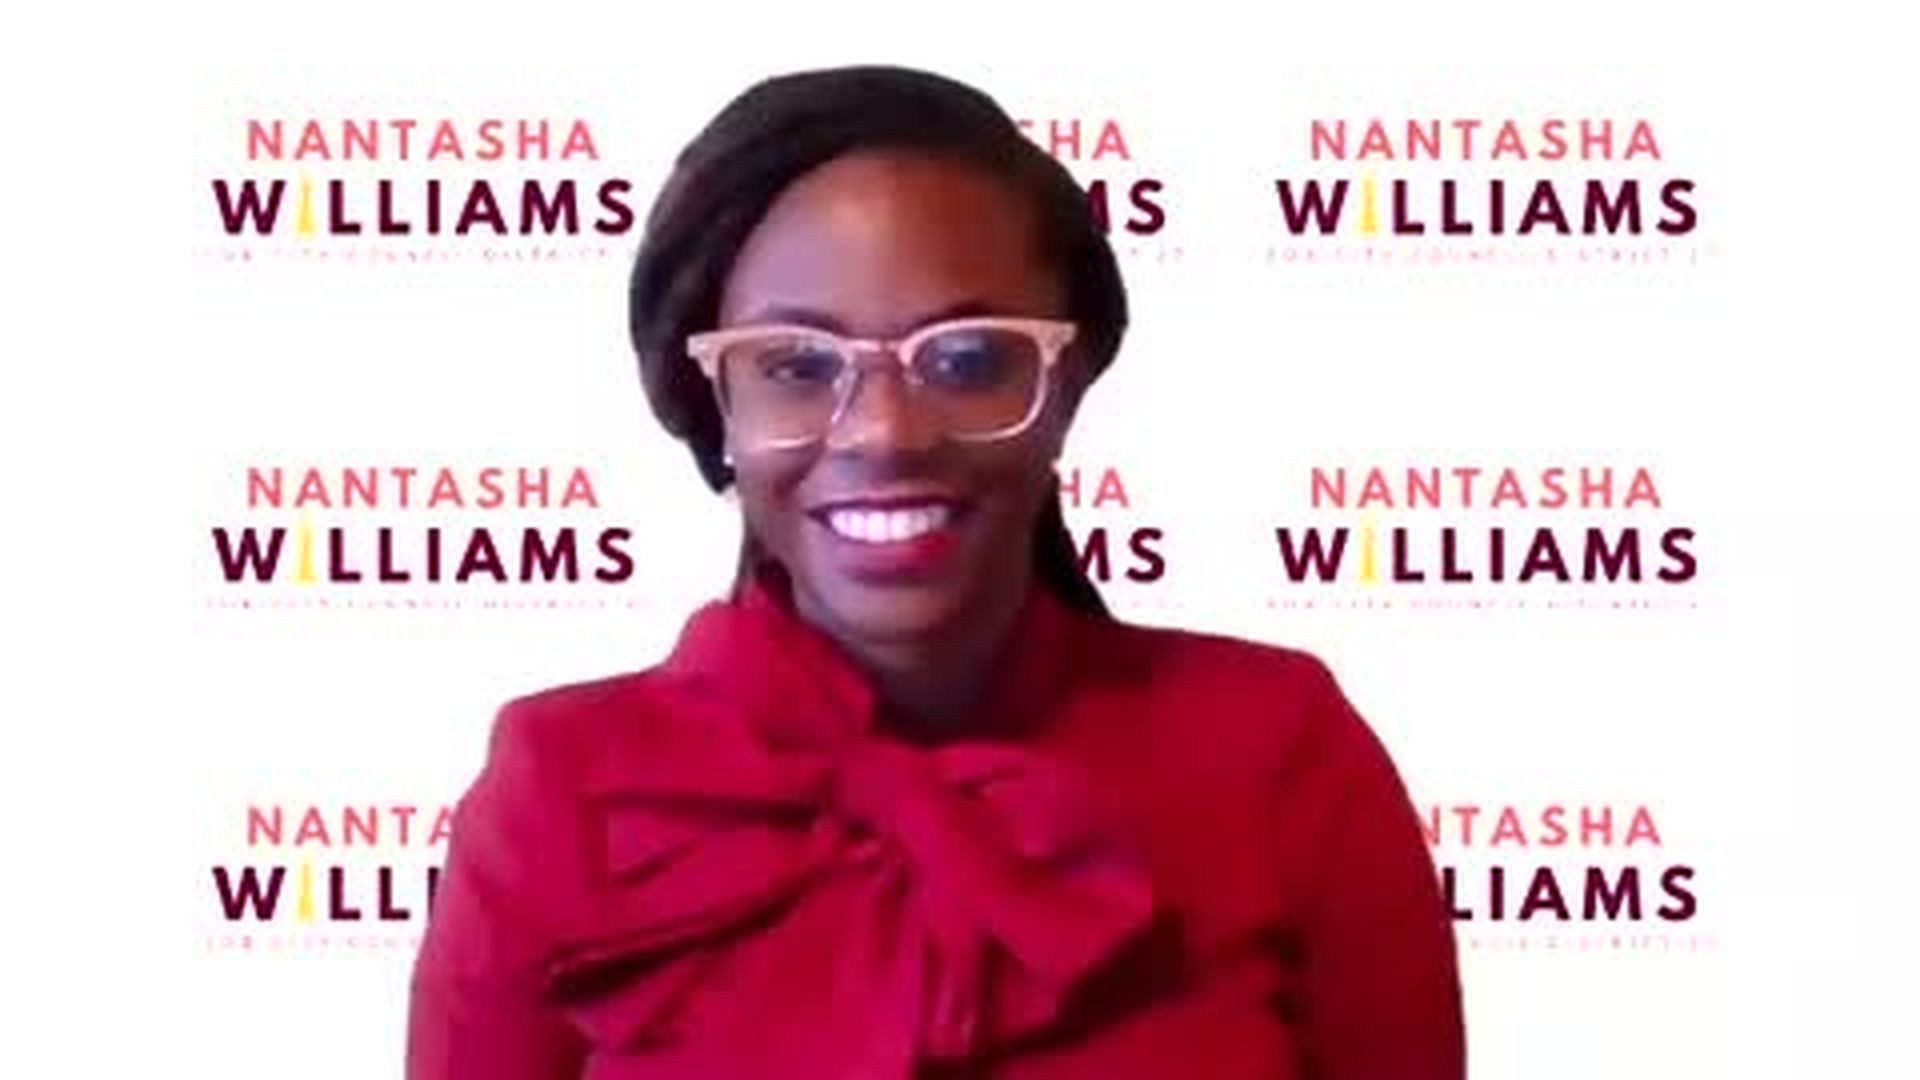 Nantasha Williams   Democratic Candidate for New York City Council District 27